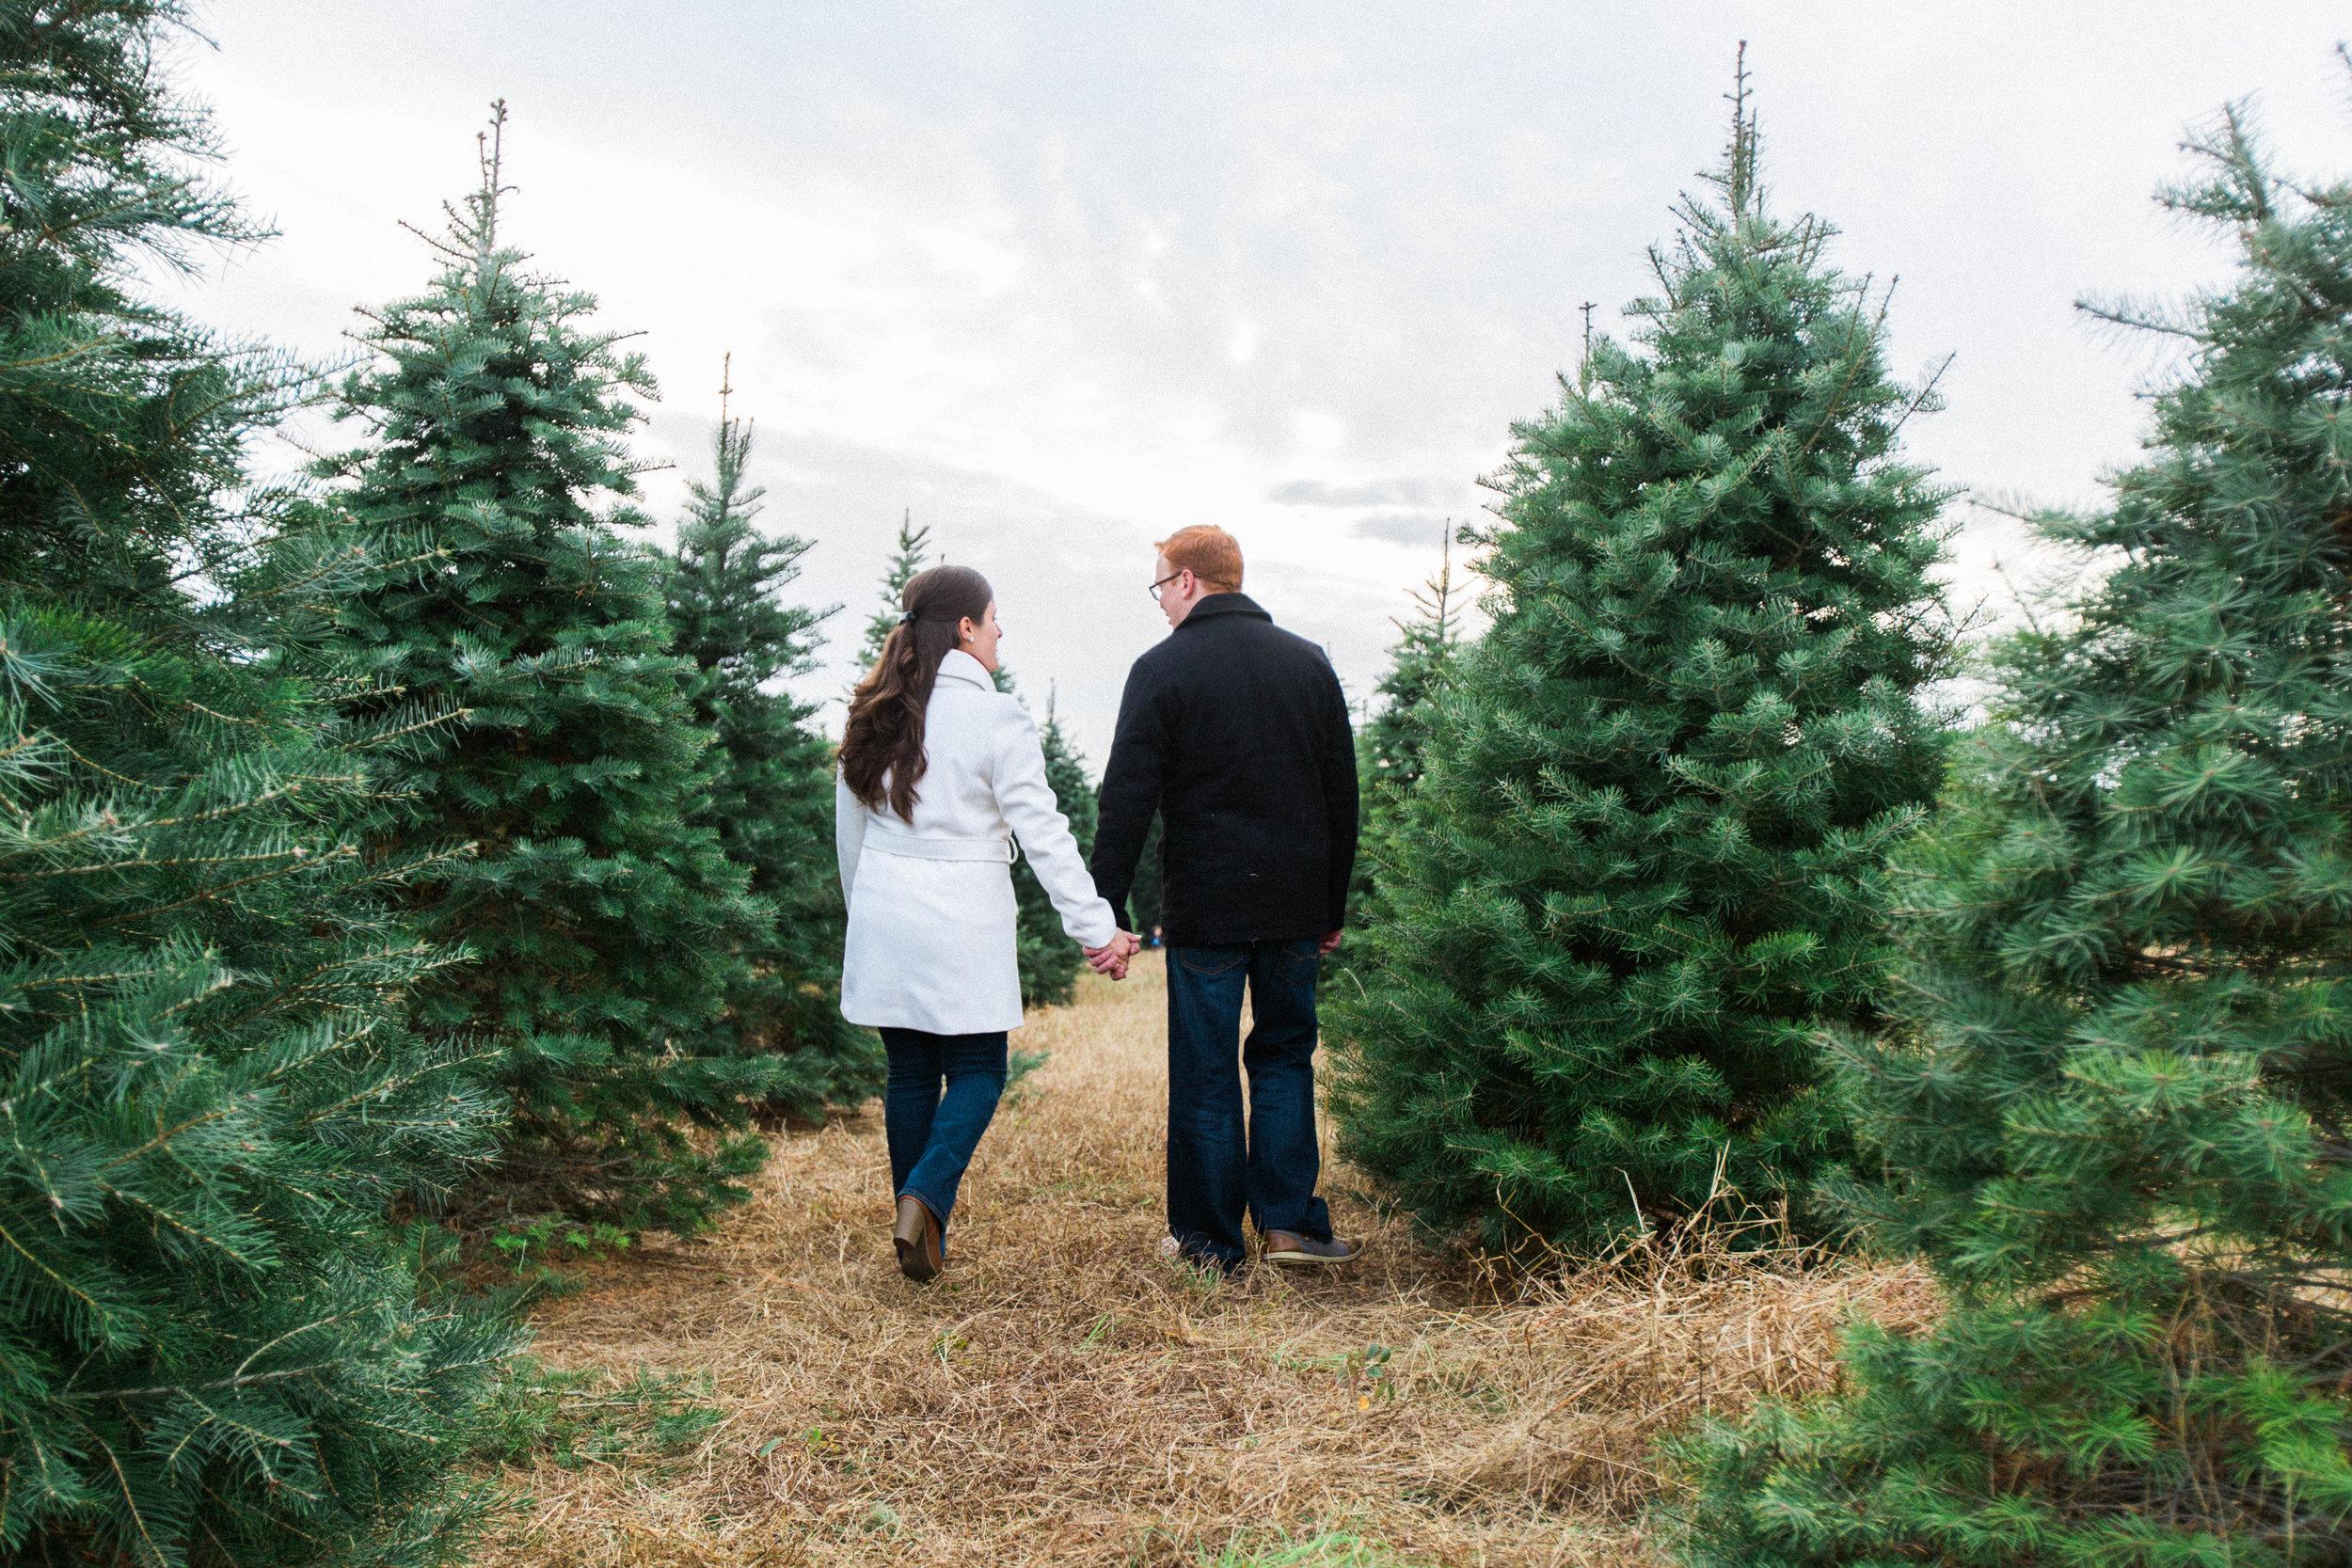 CHRISTMAS_TREE_FARM_ENGAGEMENT_PHOTOS--0050.jpg